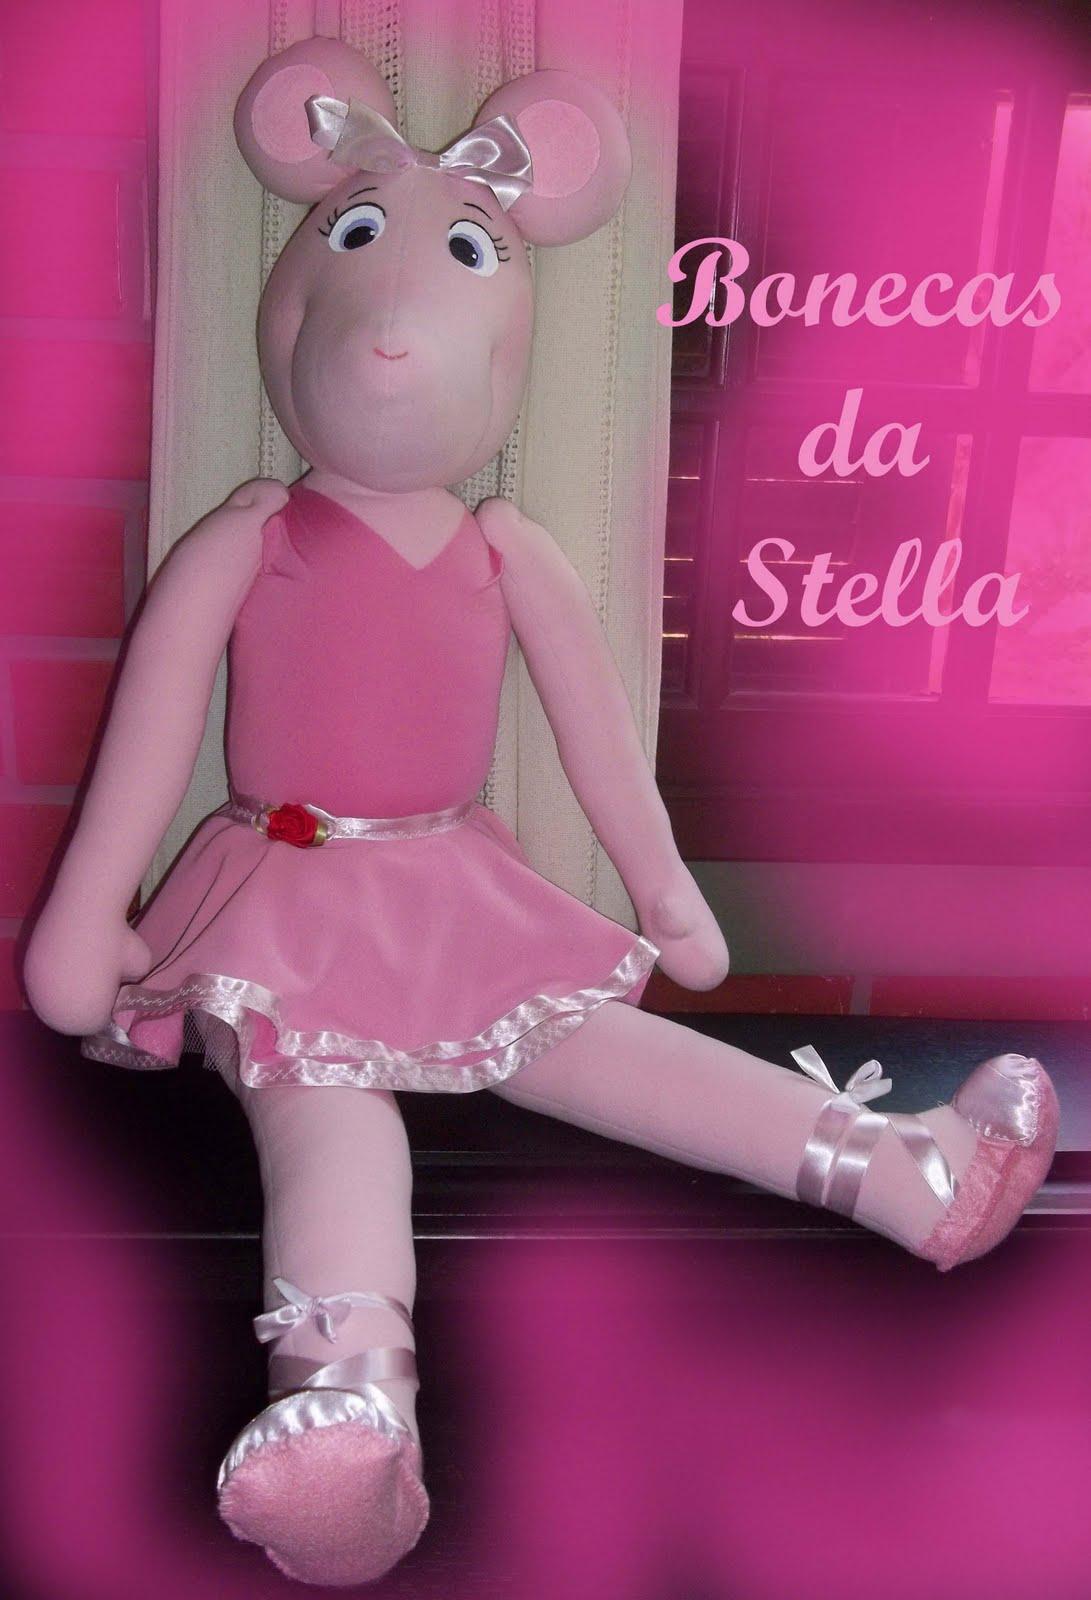 Encontrando Ideias: Festa Bailarina!!!